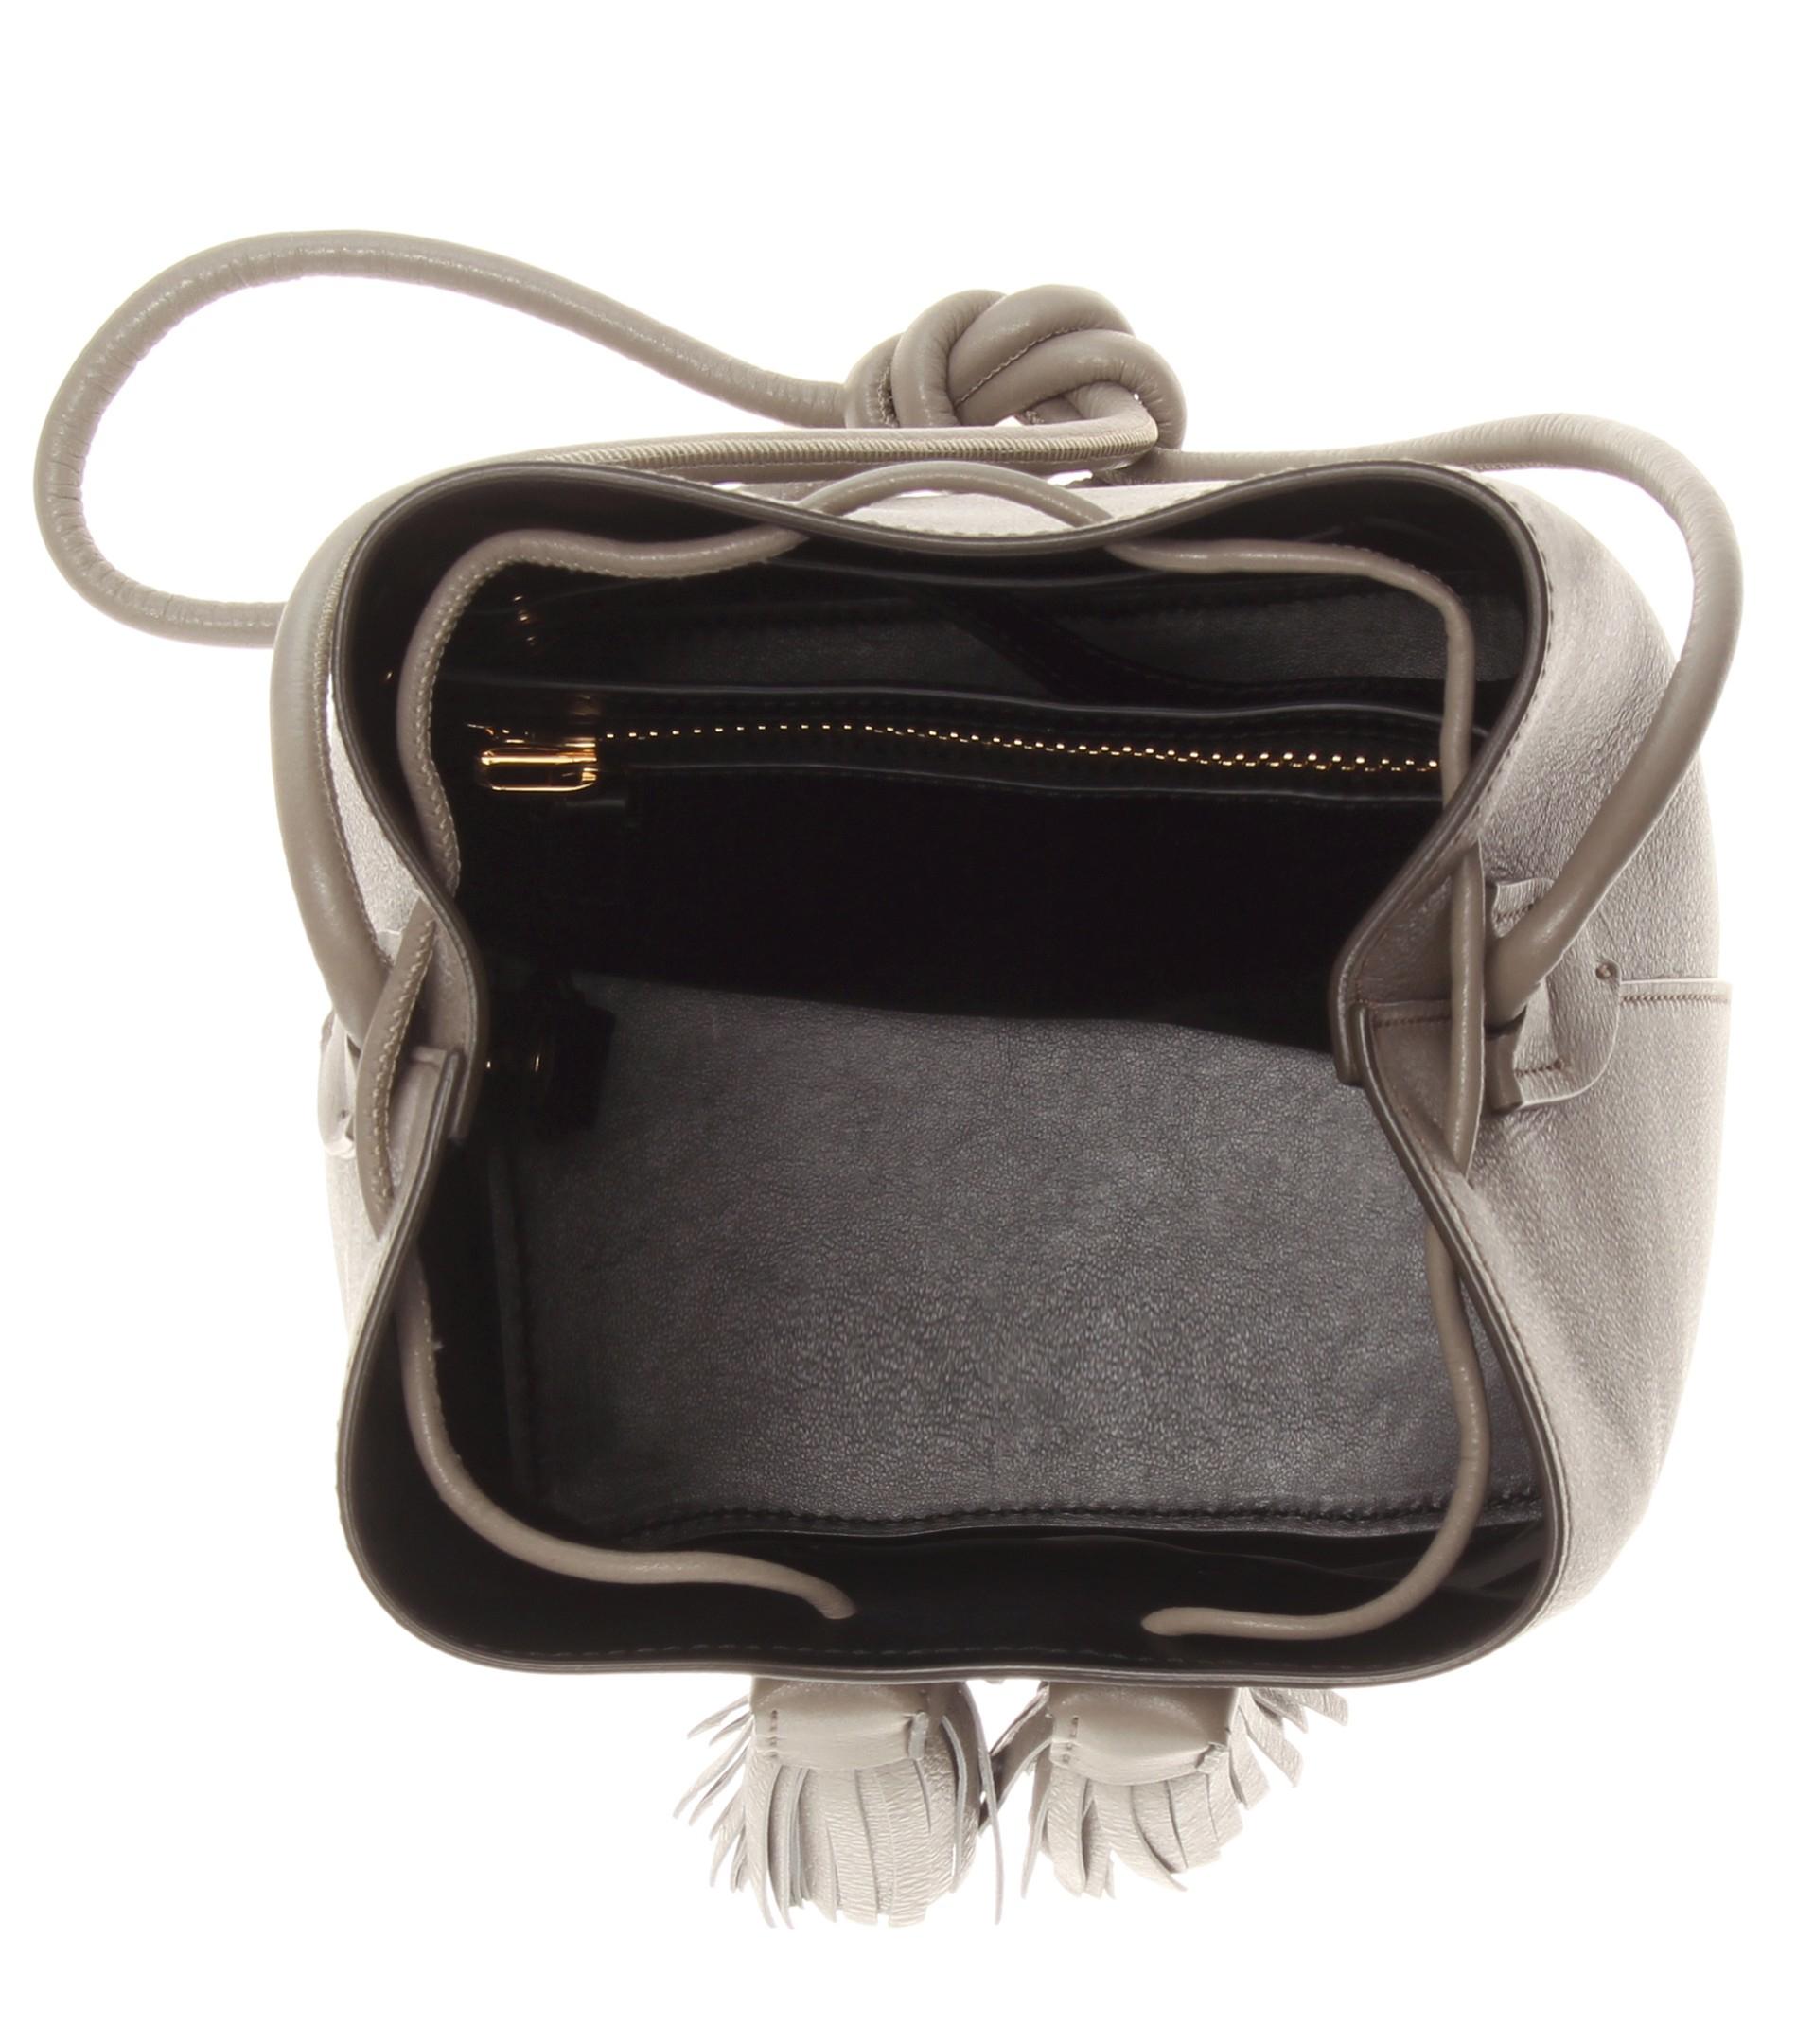 lyst tom ford leather bucket bag in natural. Black Bedroom Furniture Sets. Home Design Ideas